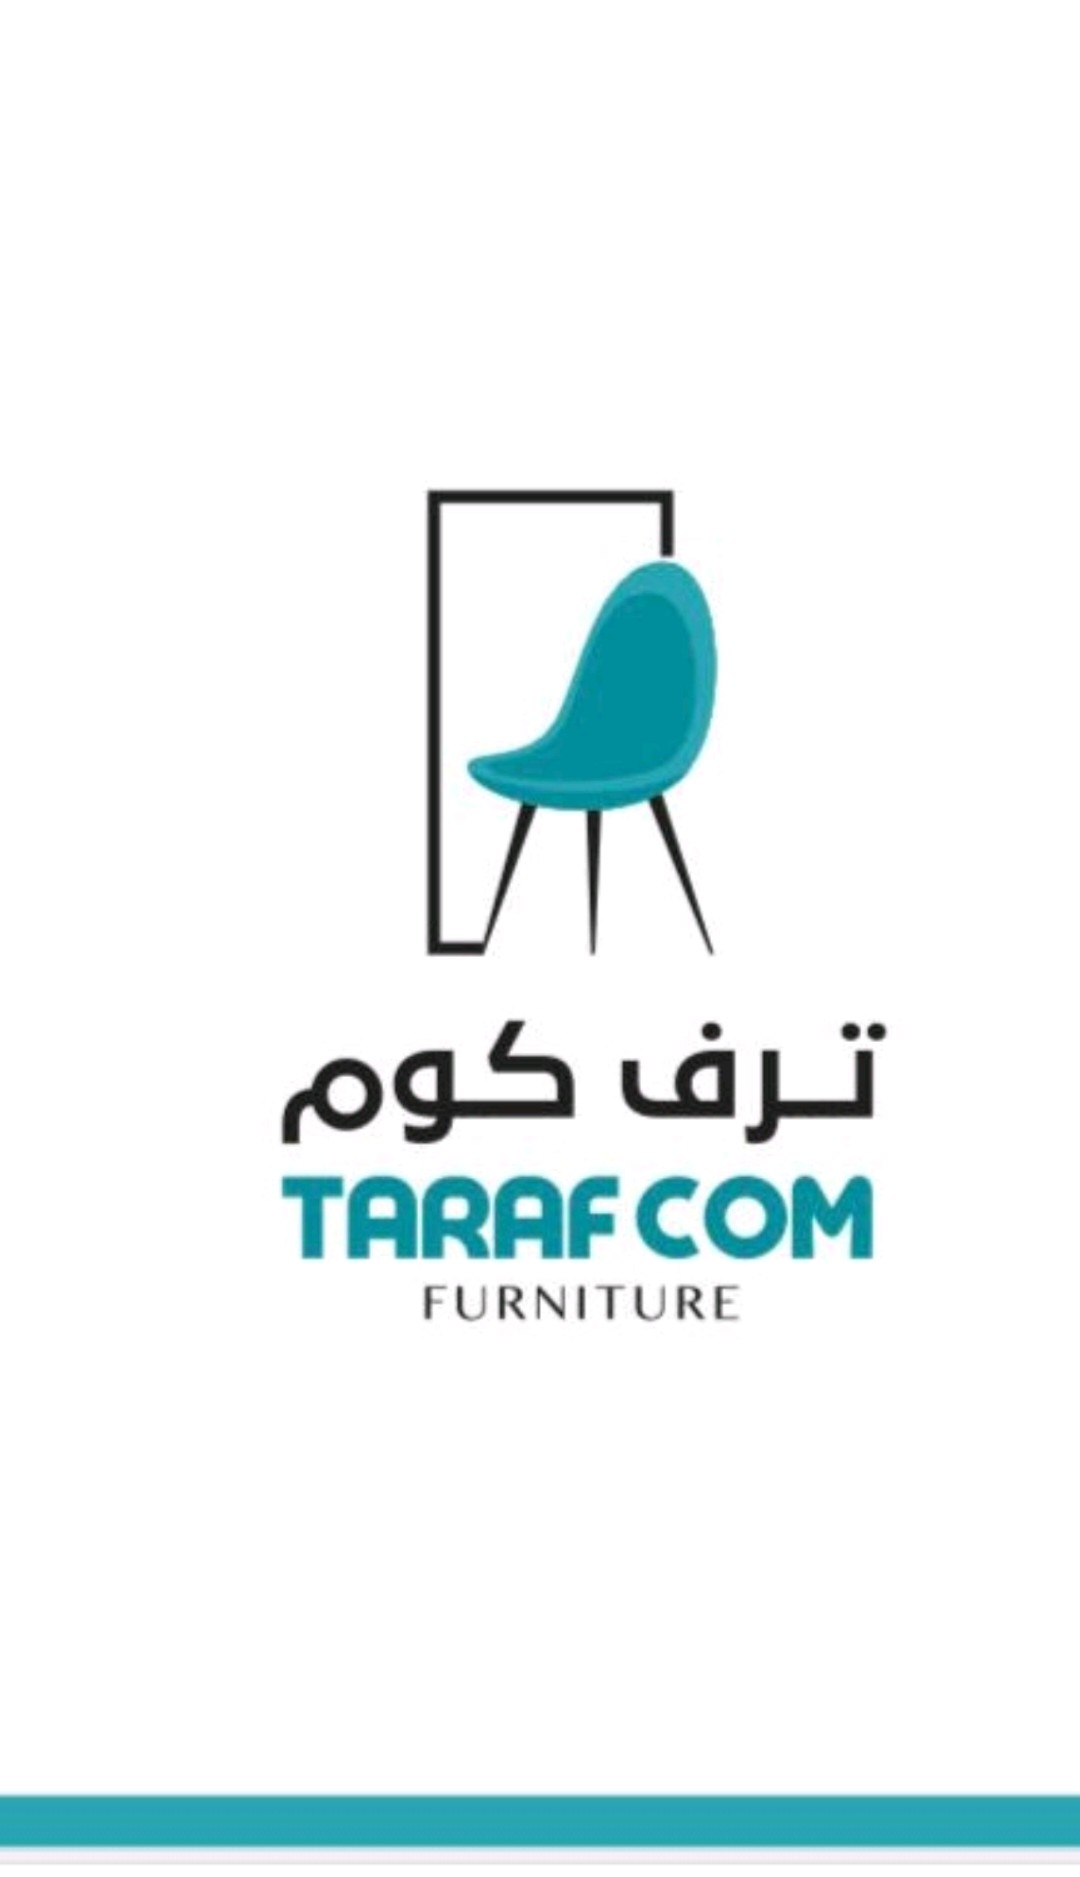 TARAFCOM